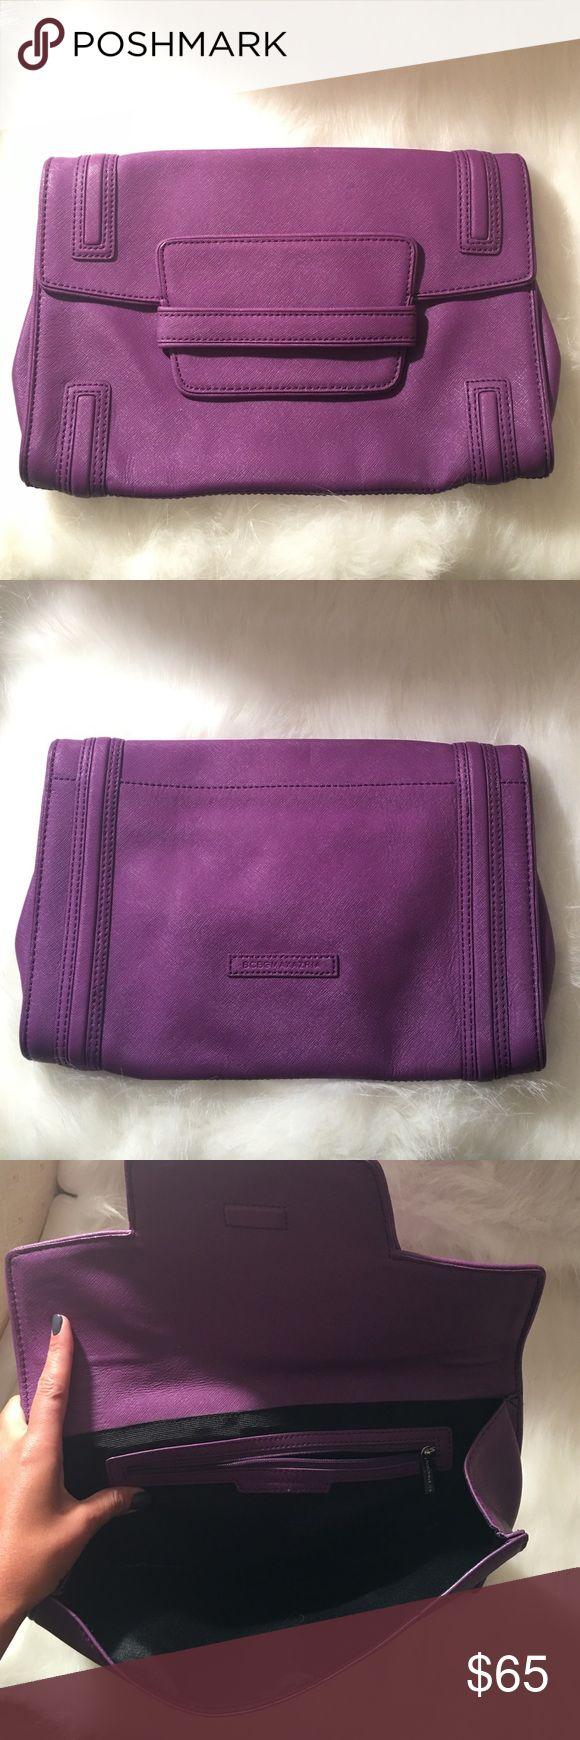 BCbg maxazria purple clutch Beautiful clutch used only once BCBGMaxAzria Bags Clutches & Wristlets